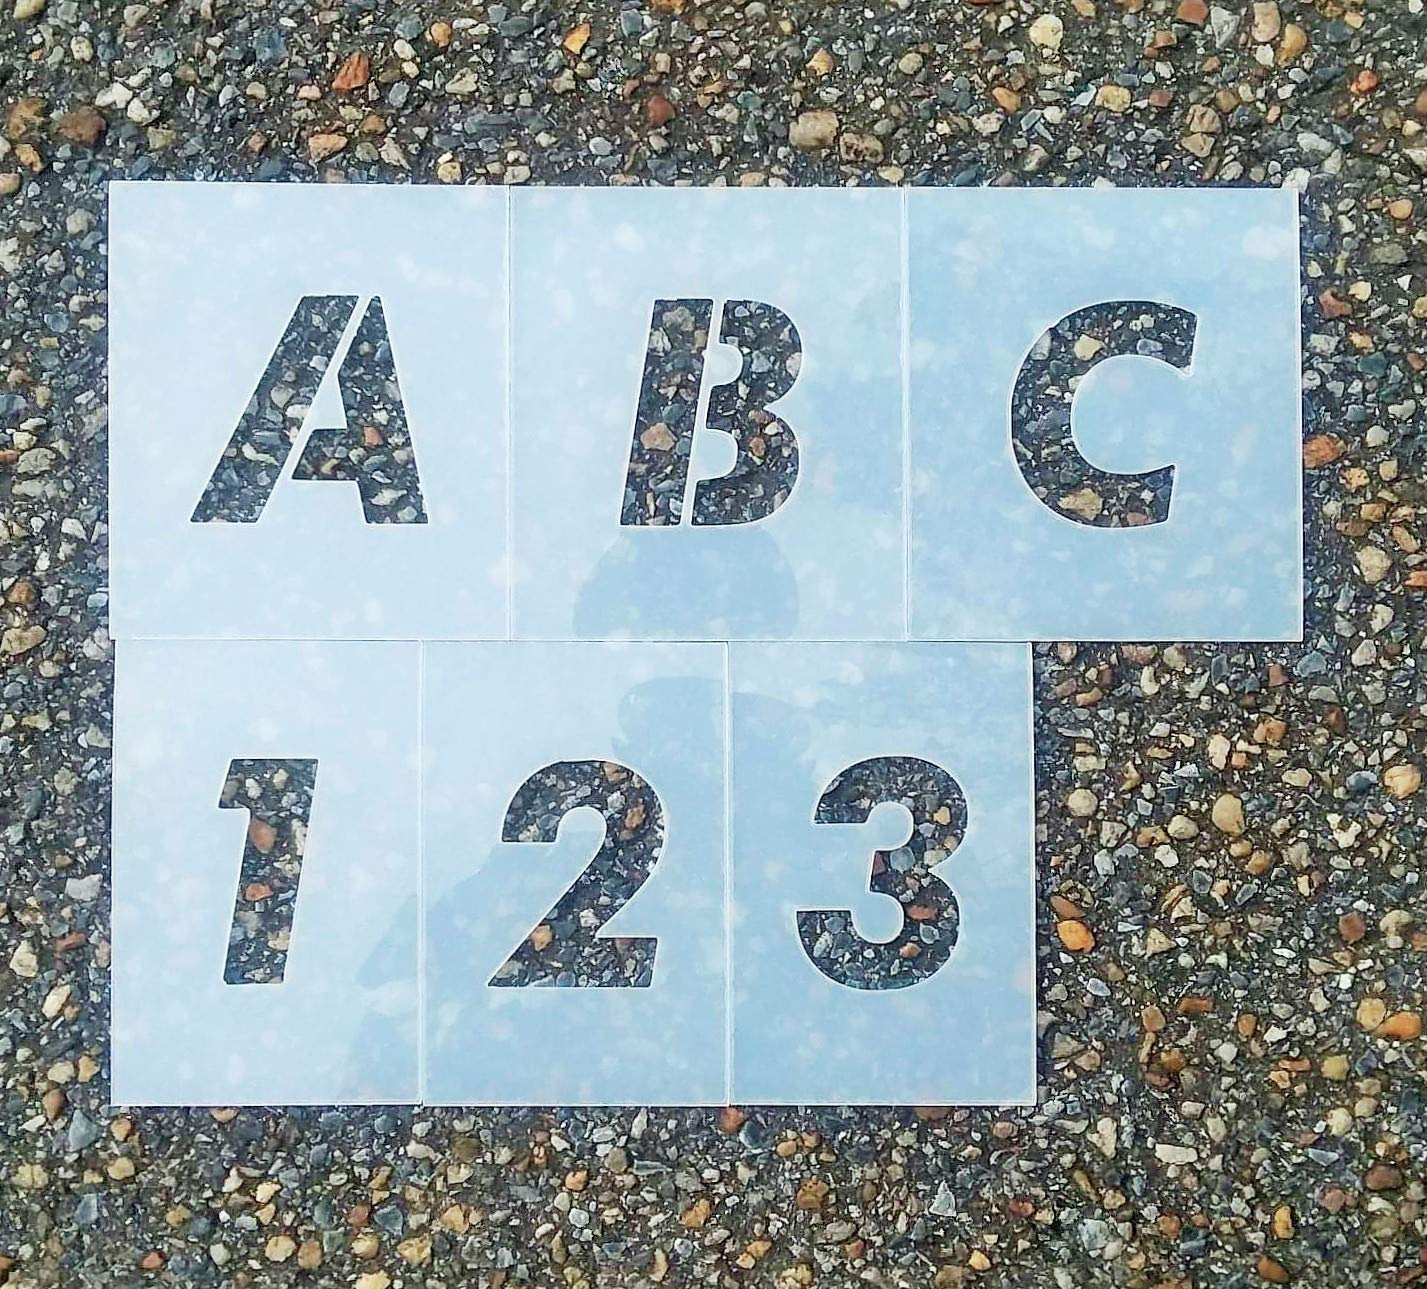 Futura フォント 駐車場 ステンシル 大文字 アルファベットと数字のセット 5 Inch 0001 5 Inch  B07KQVB9H4